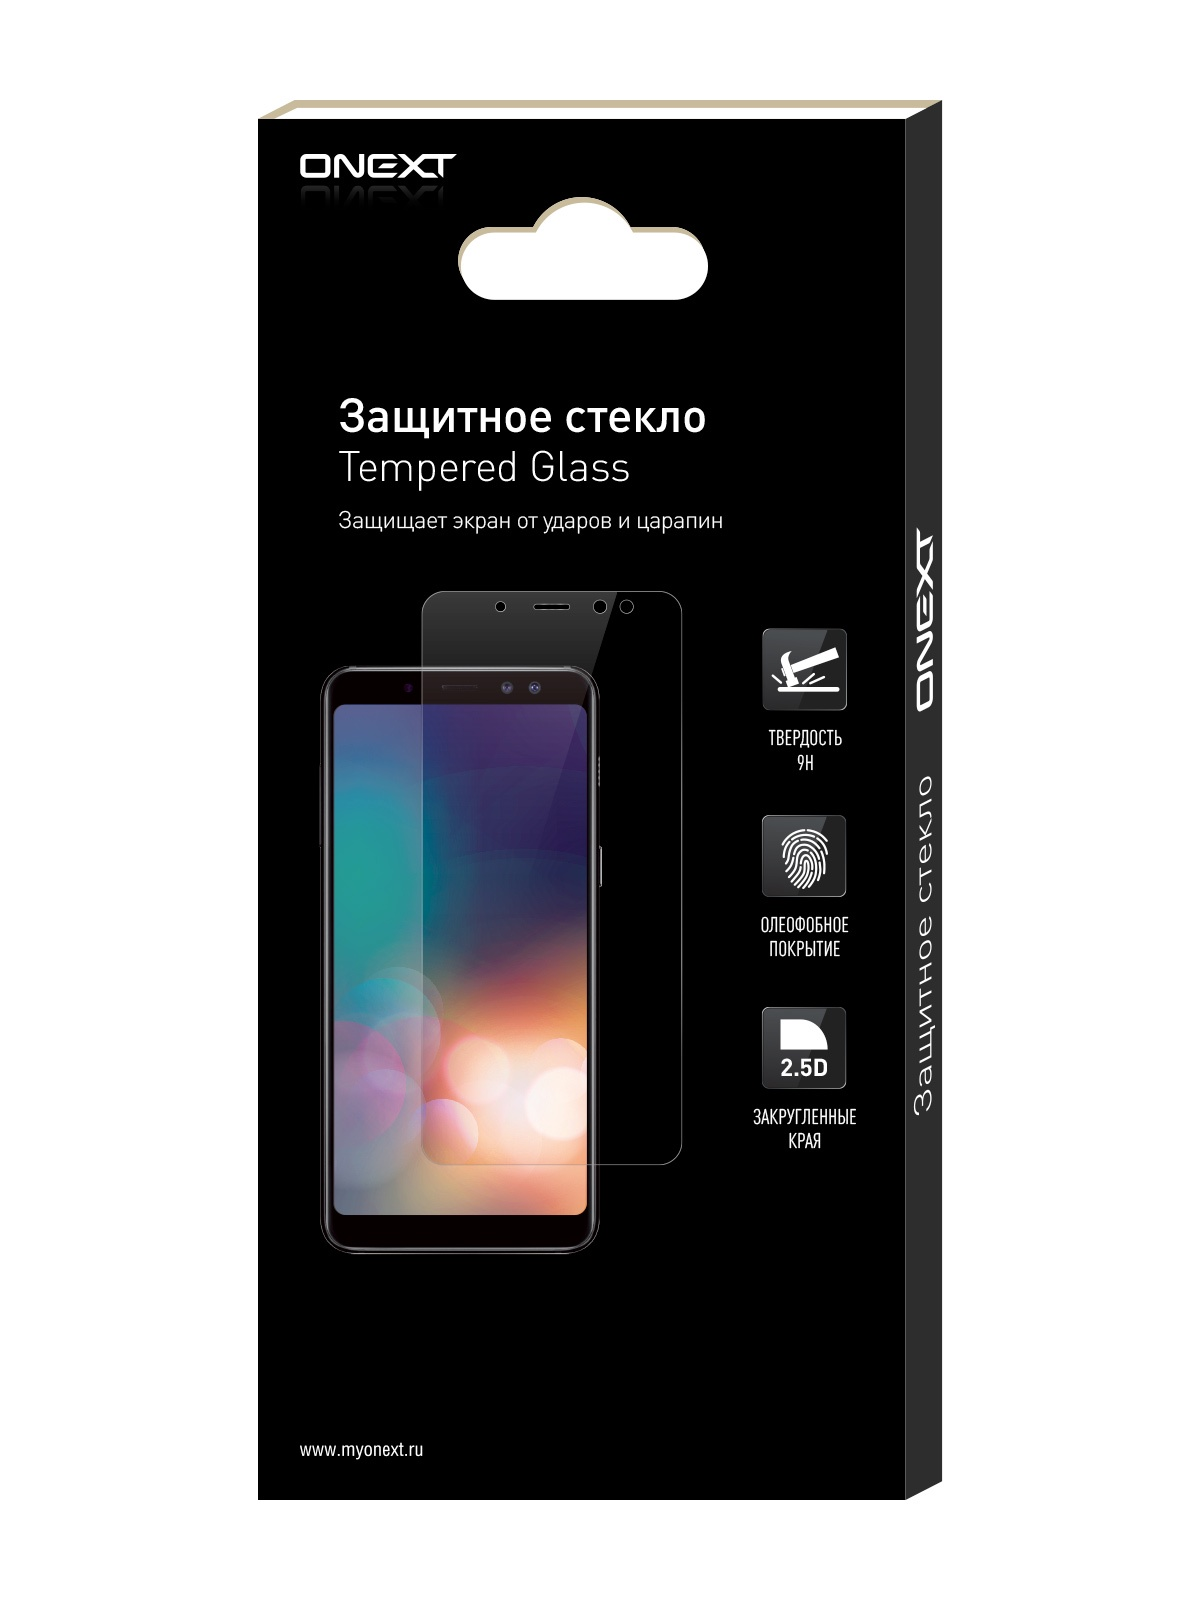 Защитное стекло ONEXT LG G4 Stylus защитное стекло caseguru для lg g4 stylus